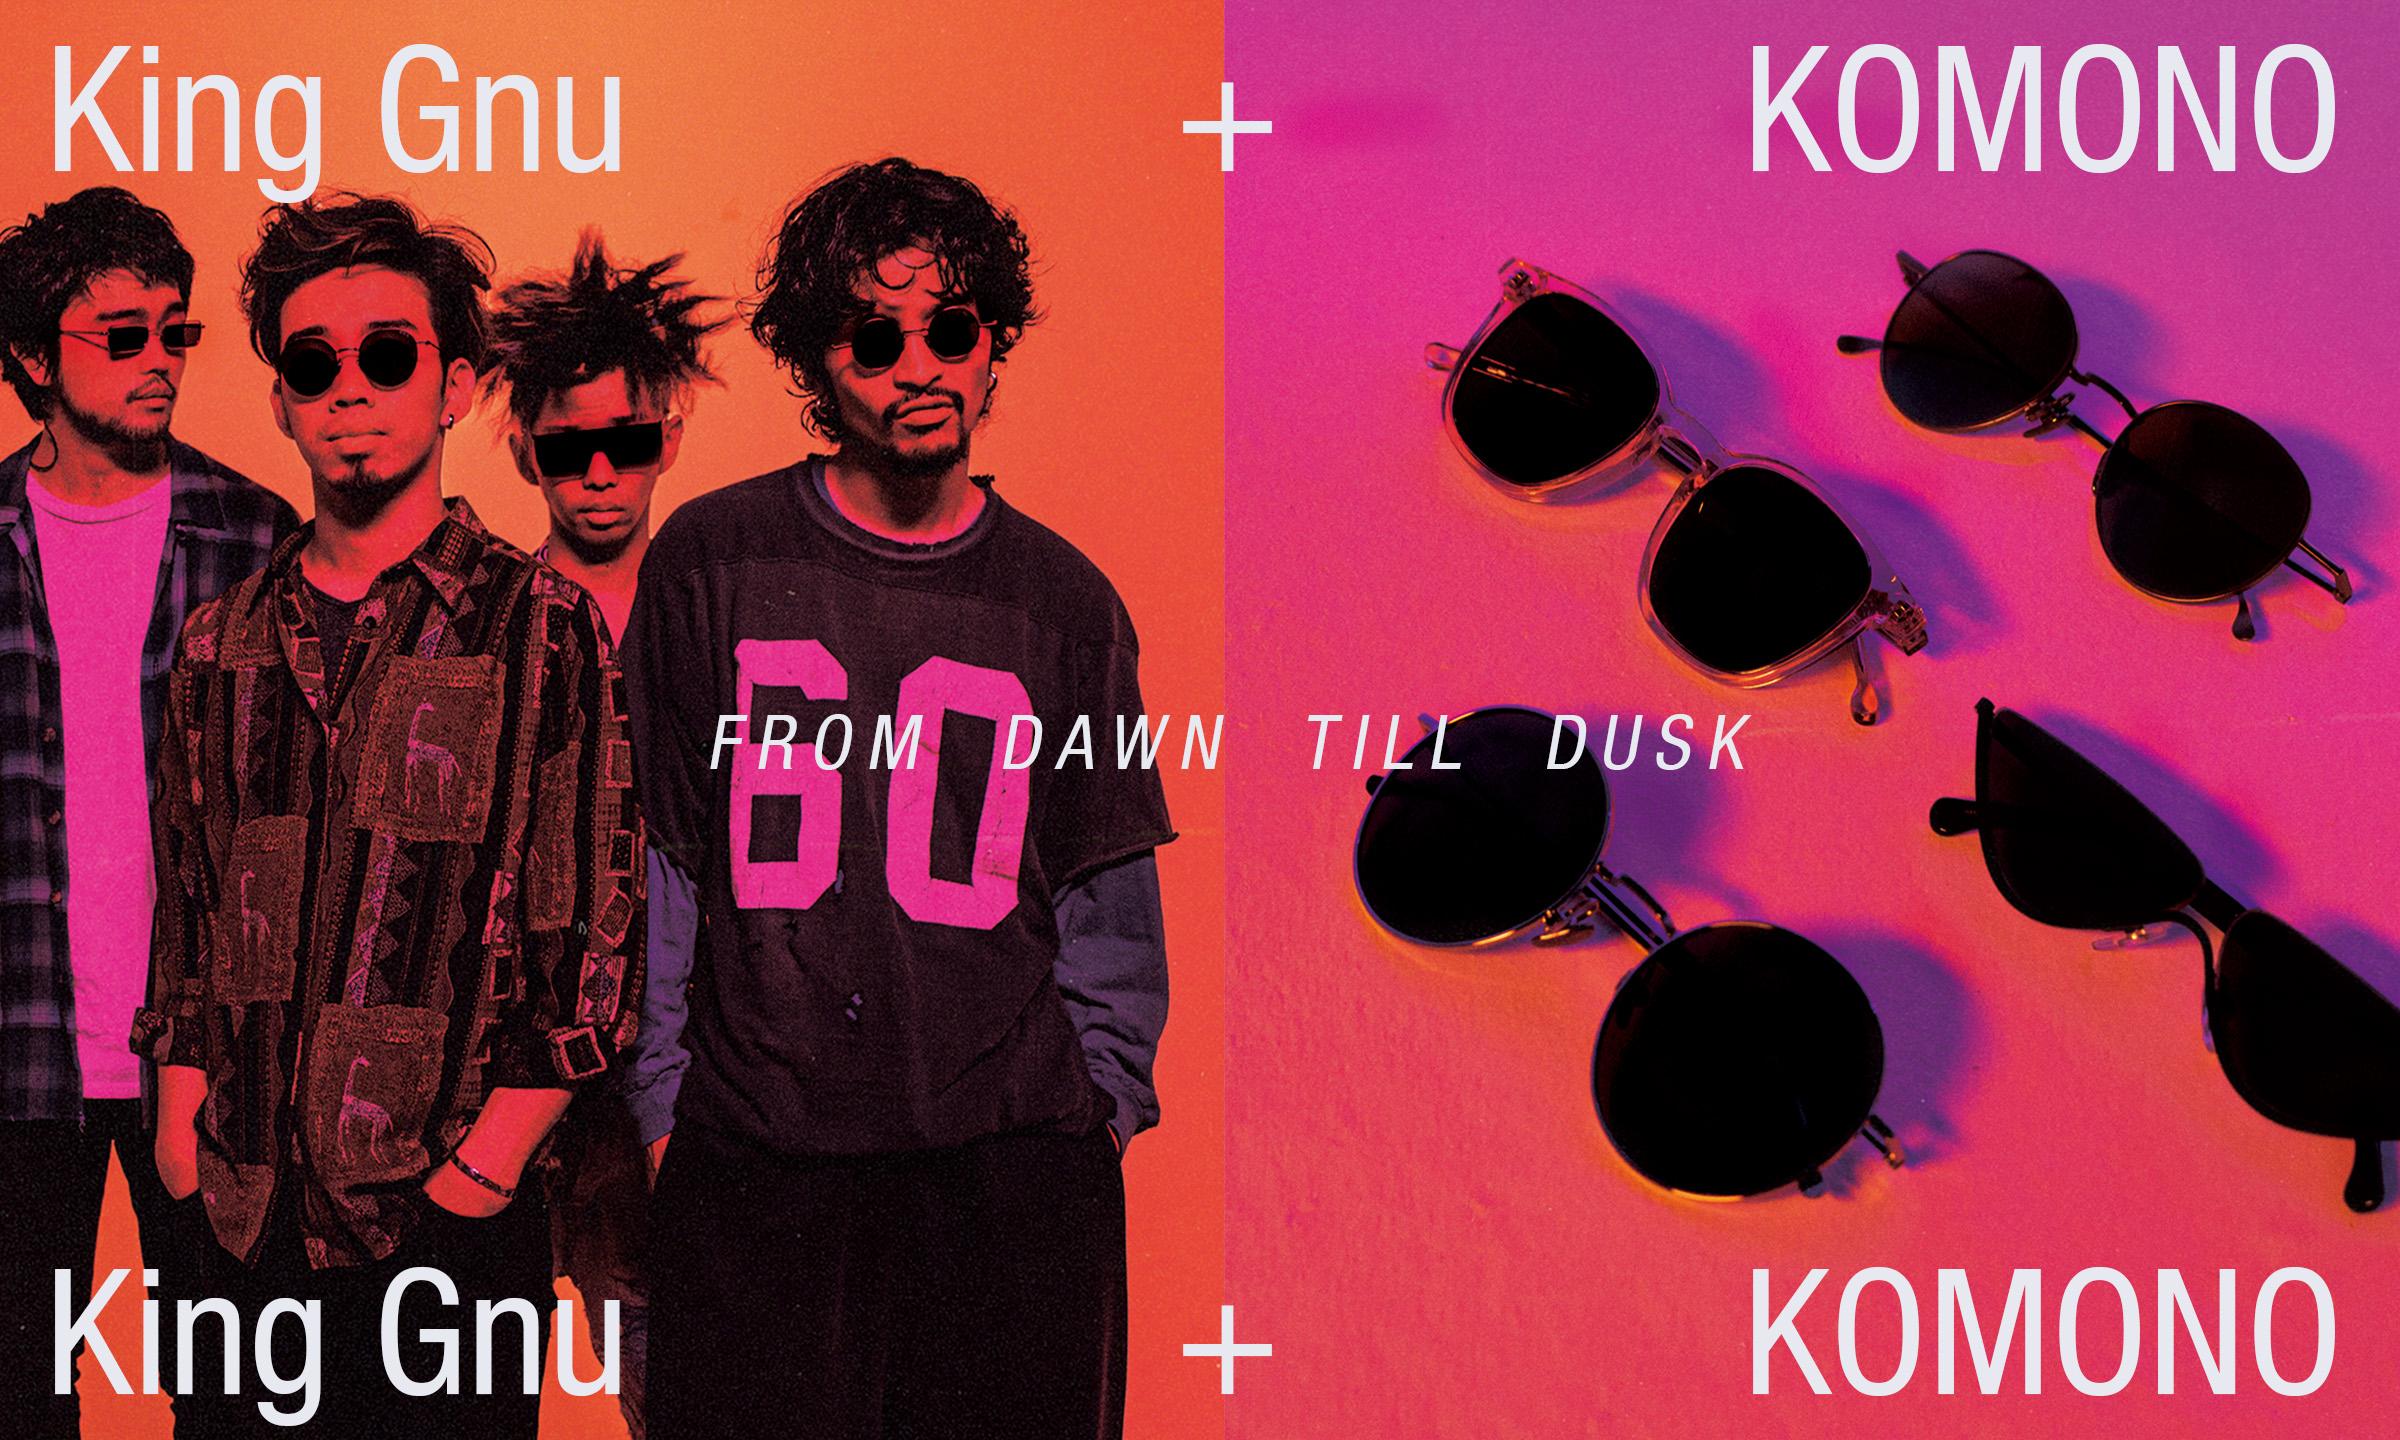 King Gnuが纏う「KOMONO」の大物の風格 -FROM DAWN TILL DUSK-